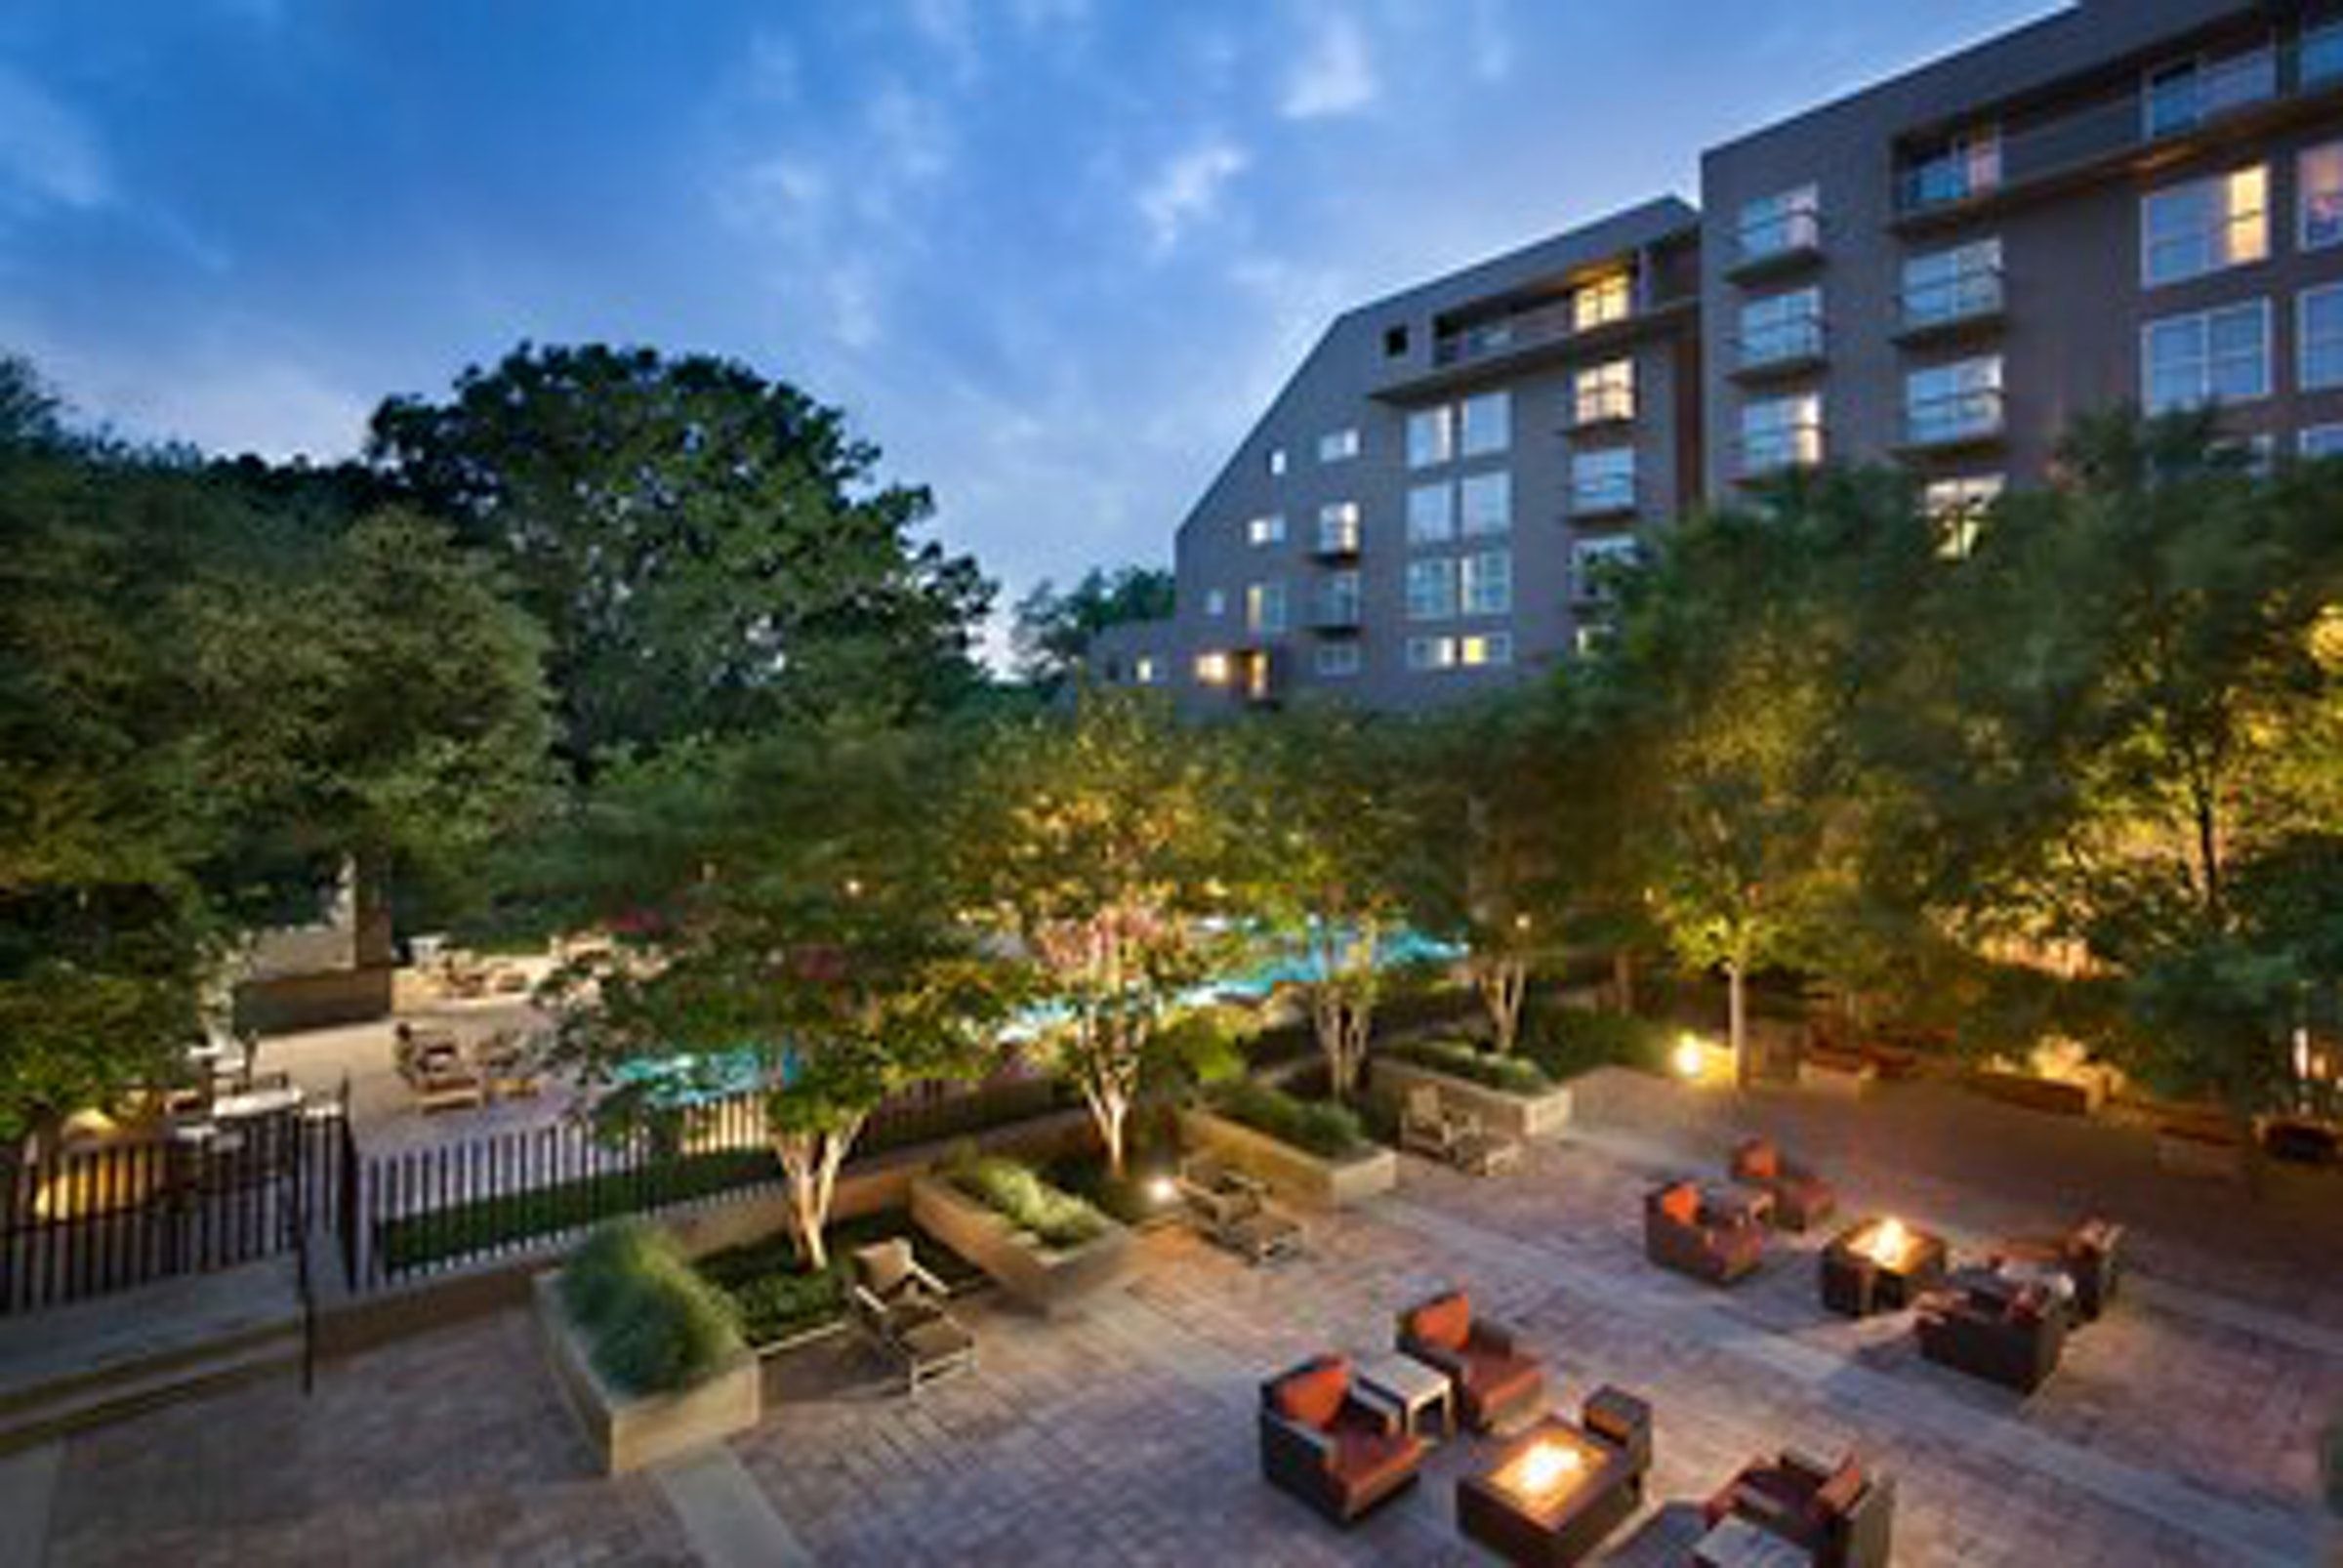 Dallas/Fort Worth Marriott Solana in Beyond Dallas